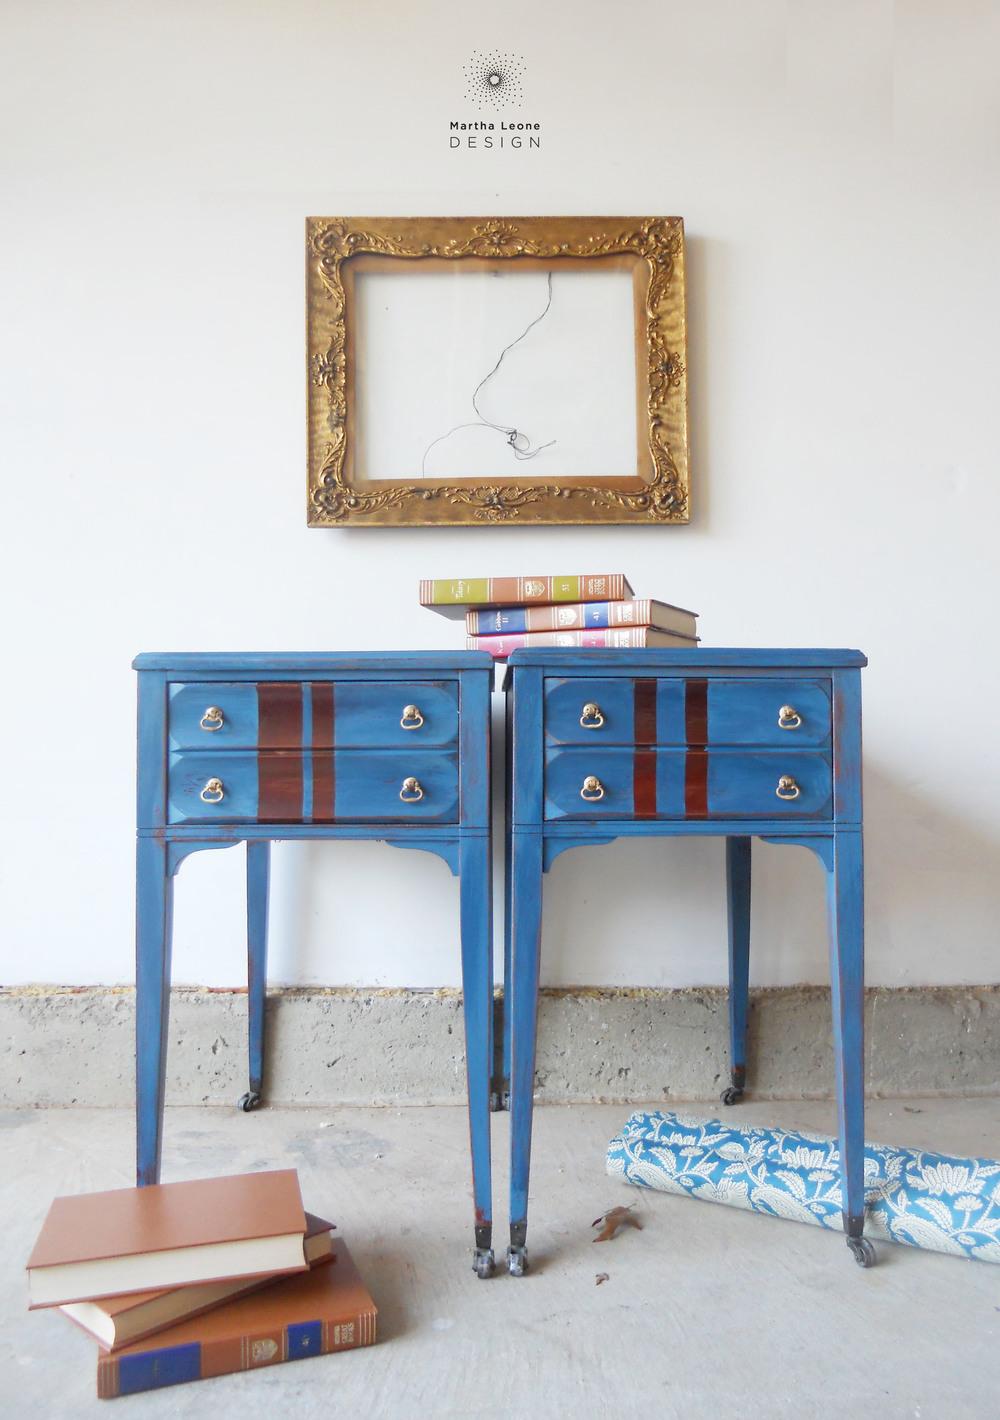 end-tables4-by-martha-leone-design.jpg